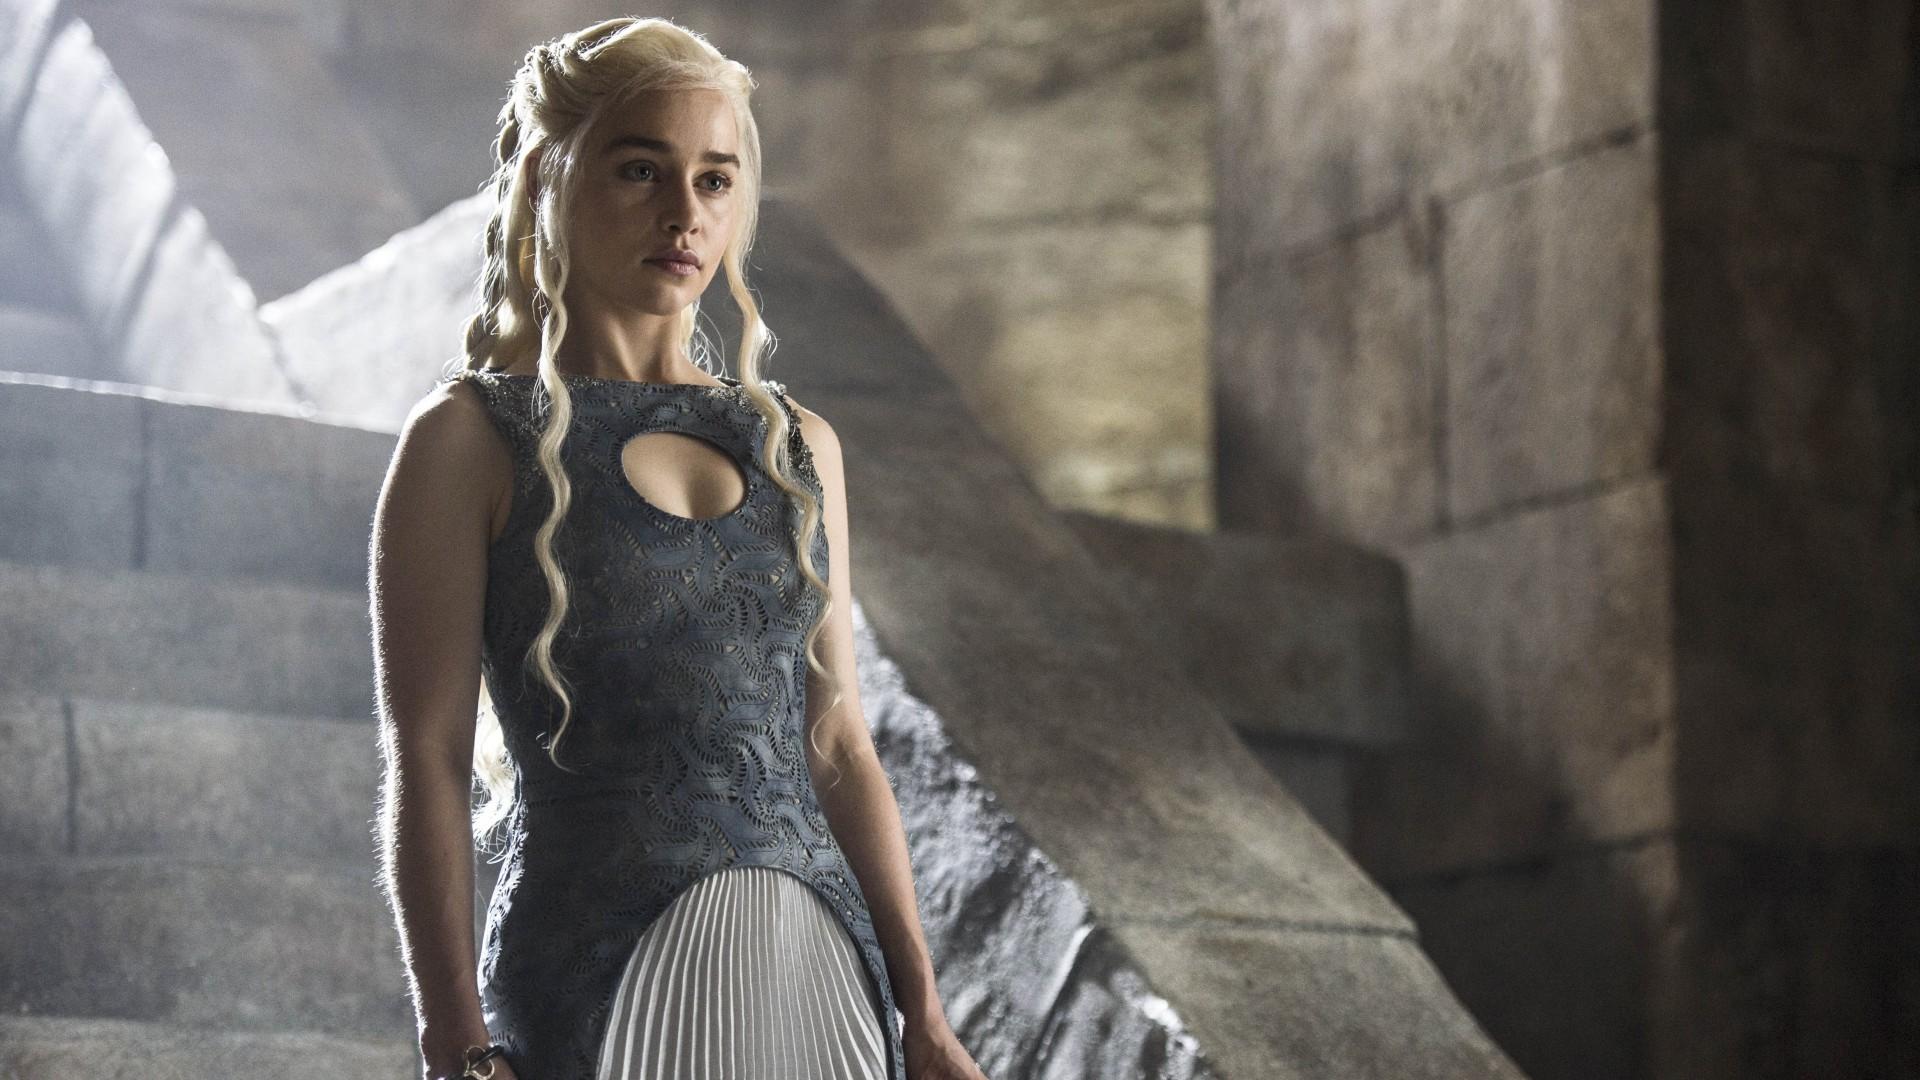 Wallpaper Daenerys Targaryen, Season 4, Game of Thrones, Emilia Clarke, 4K,  TV Series, #1123